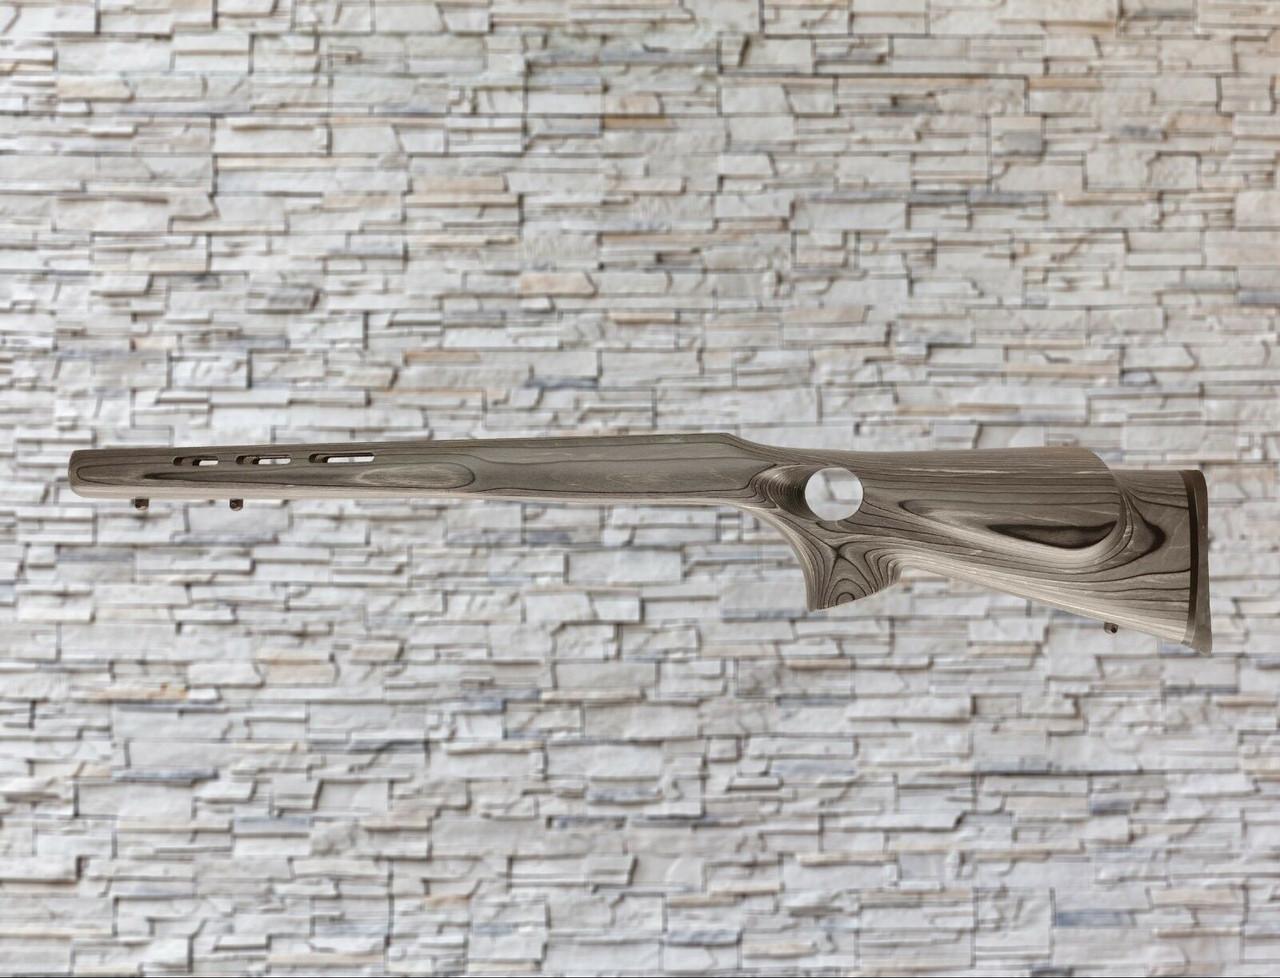 Boyds Rimfire Varmint TH Bull Barrel Wood Stock Pepper for Savage 93R//93E//MarkII